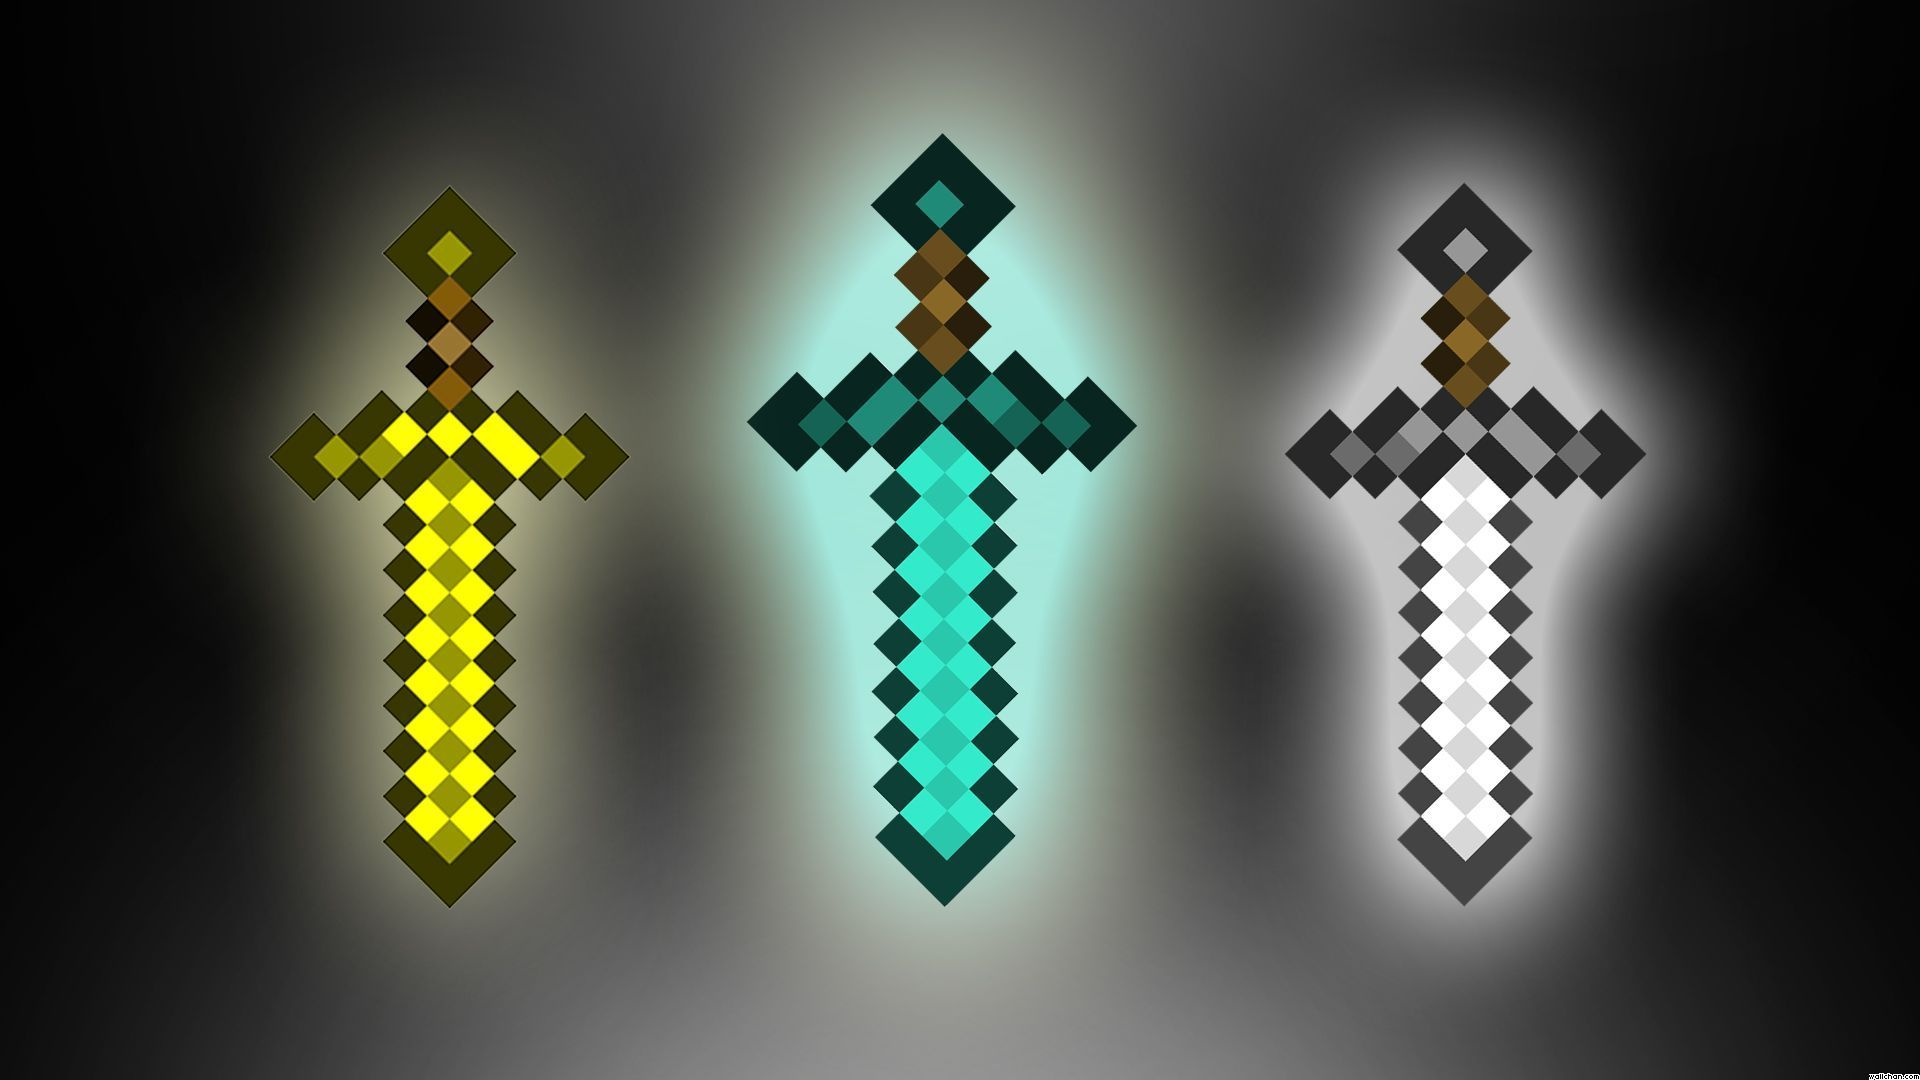 Minecraft Diamond Armor Wallpapers On Wallpaperdog